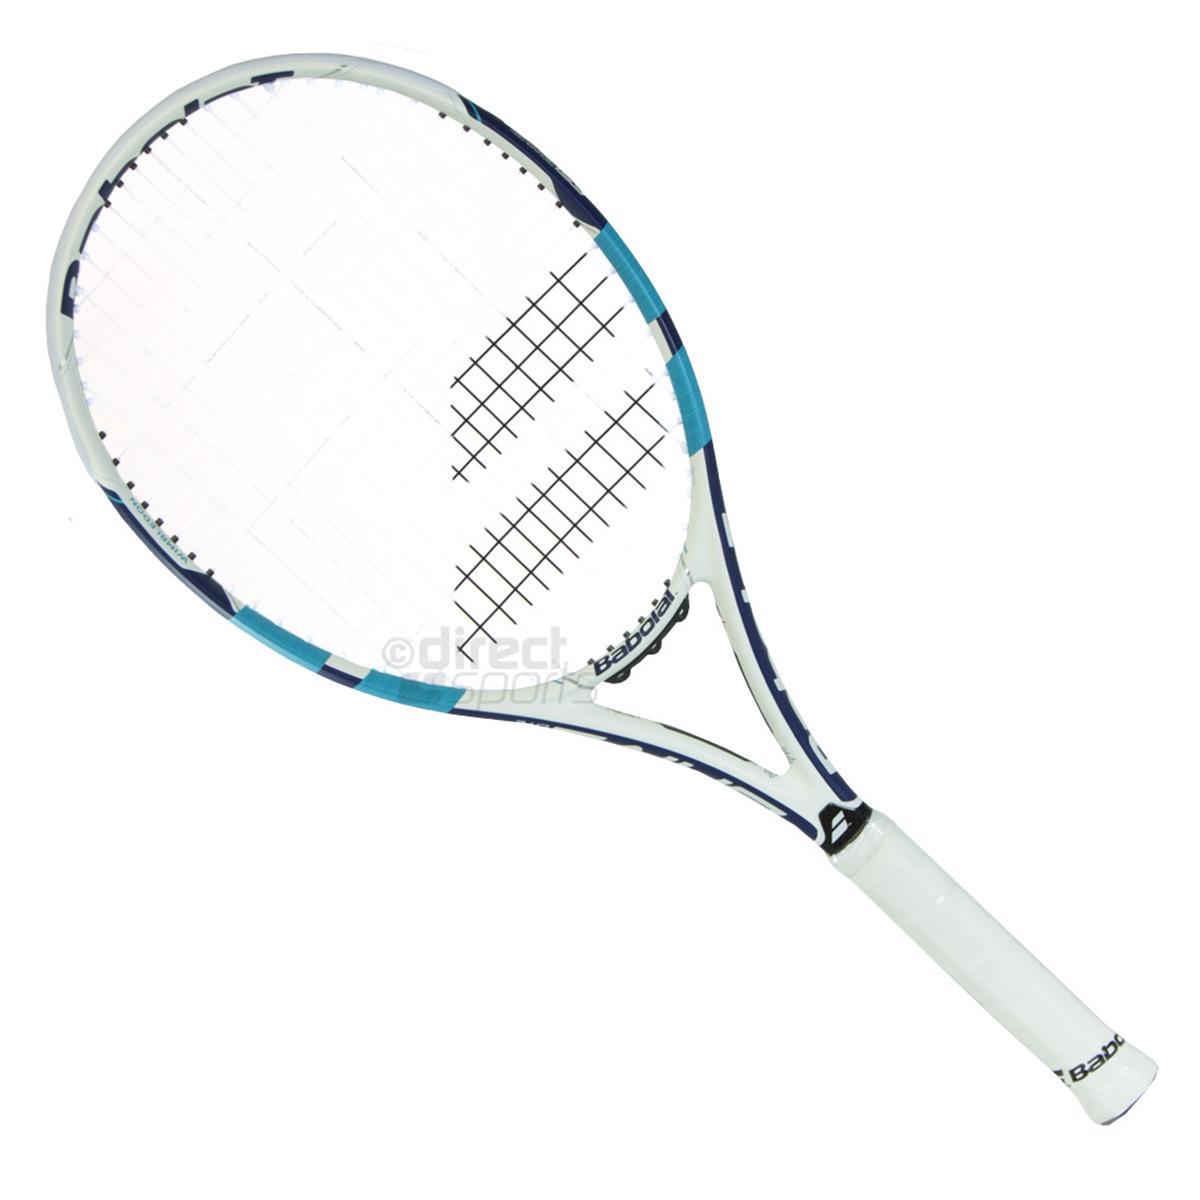 Babolat wimbledon pure drive lite tennis racket direct tennis - Babolat pure drive lite tennis racquet ...